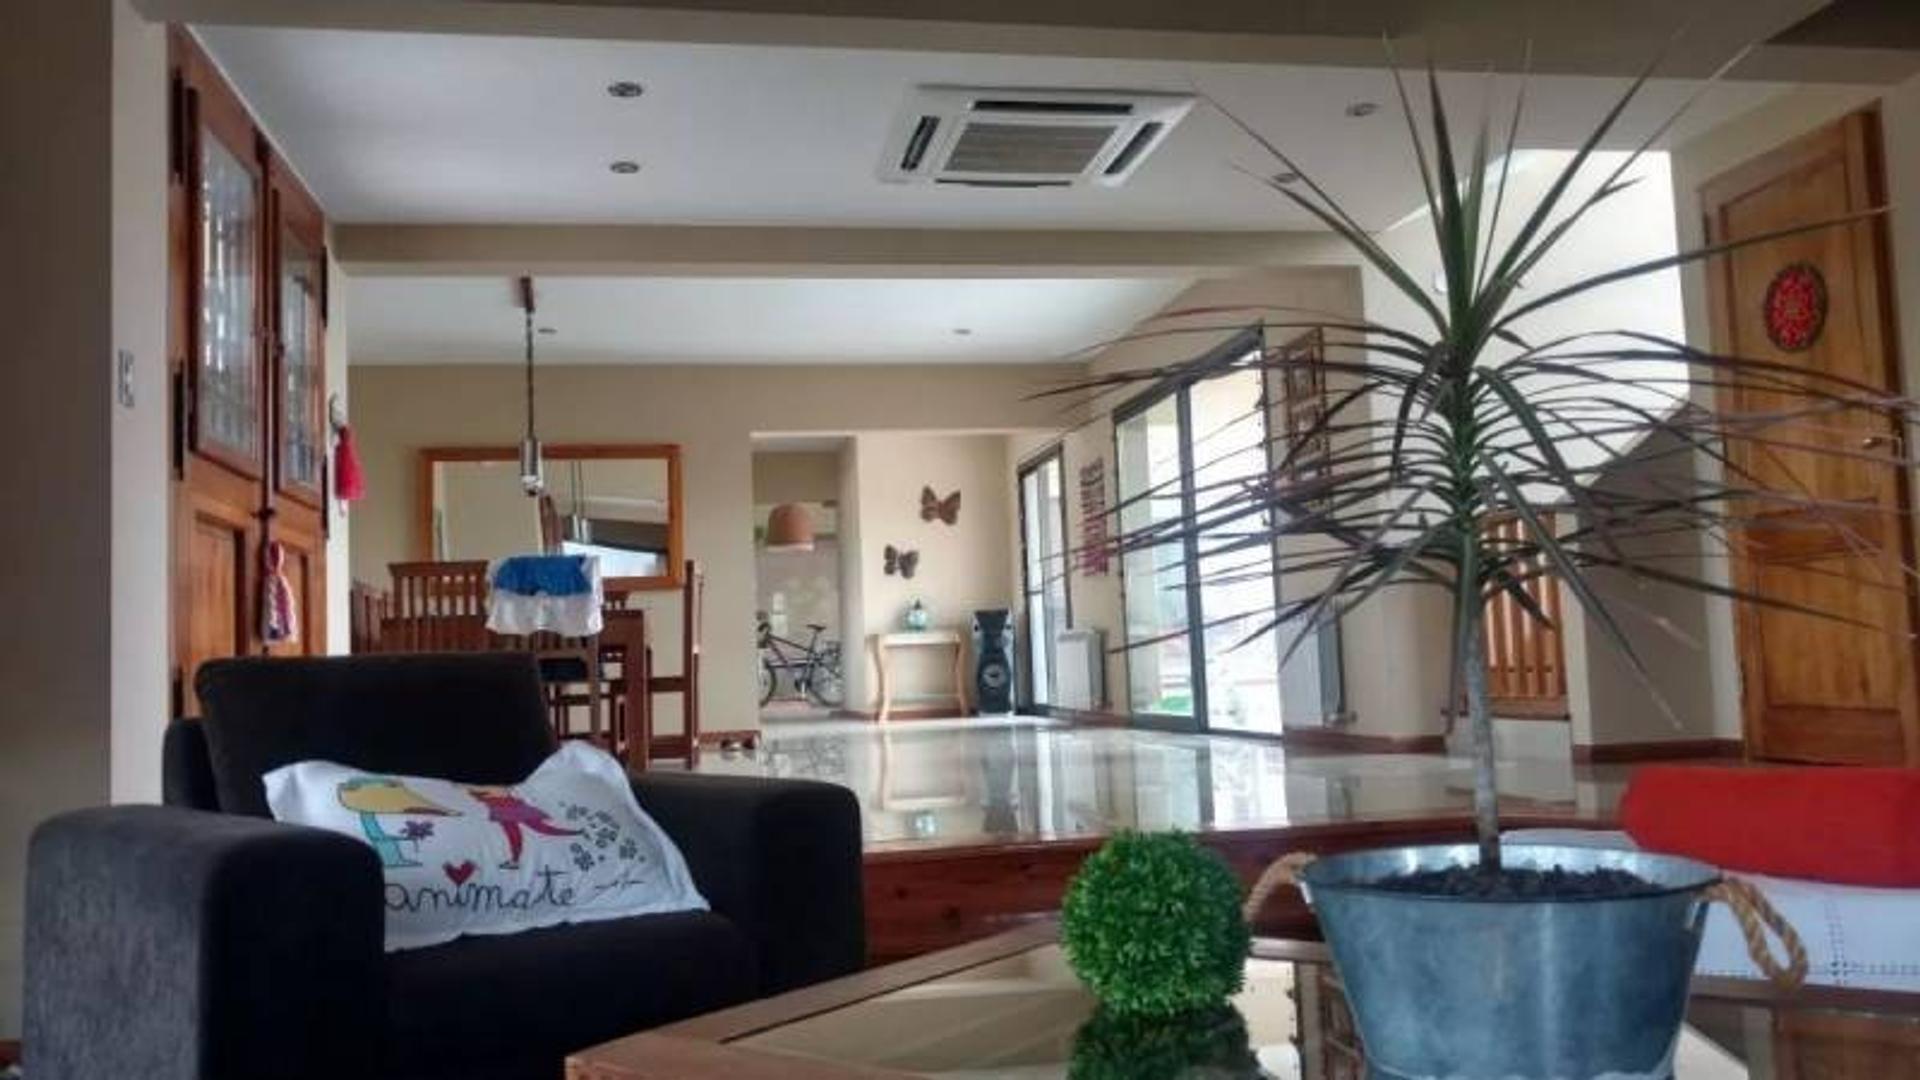 Susana Aravena Propiedades FV Vende esplendida casa en Haras Santa Maria Escobar